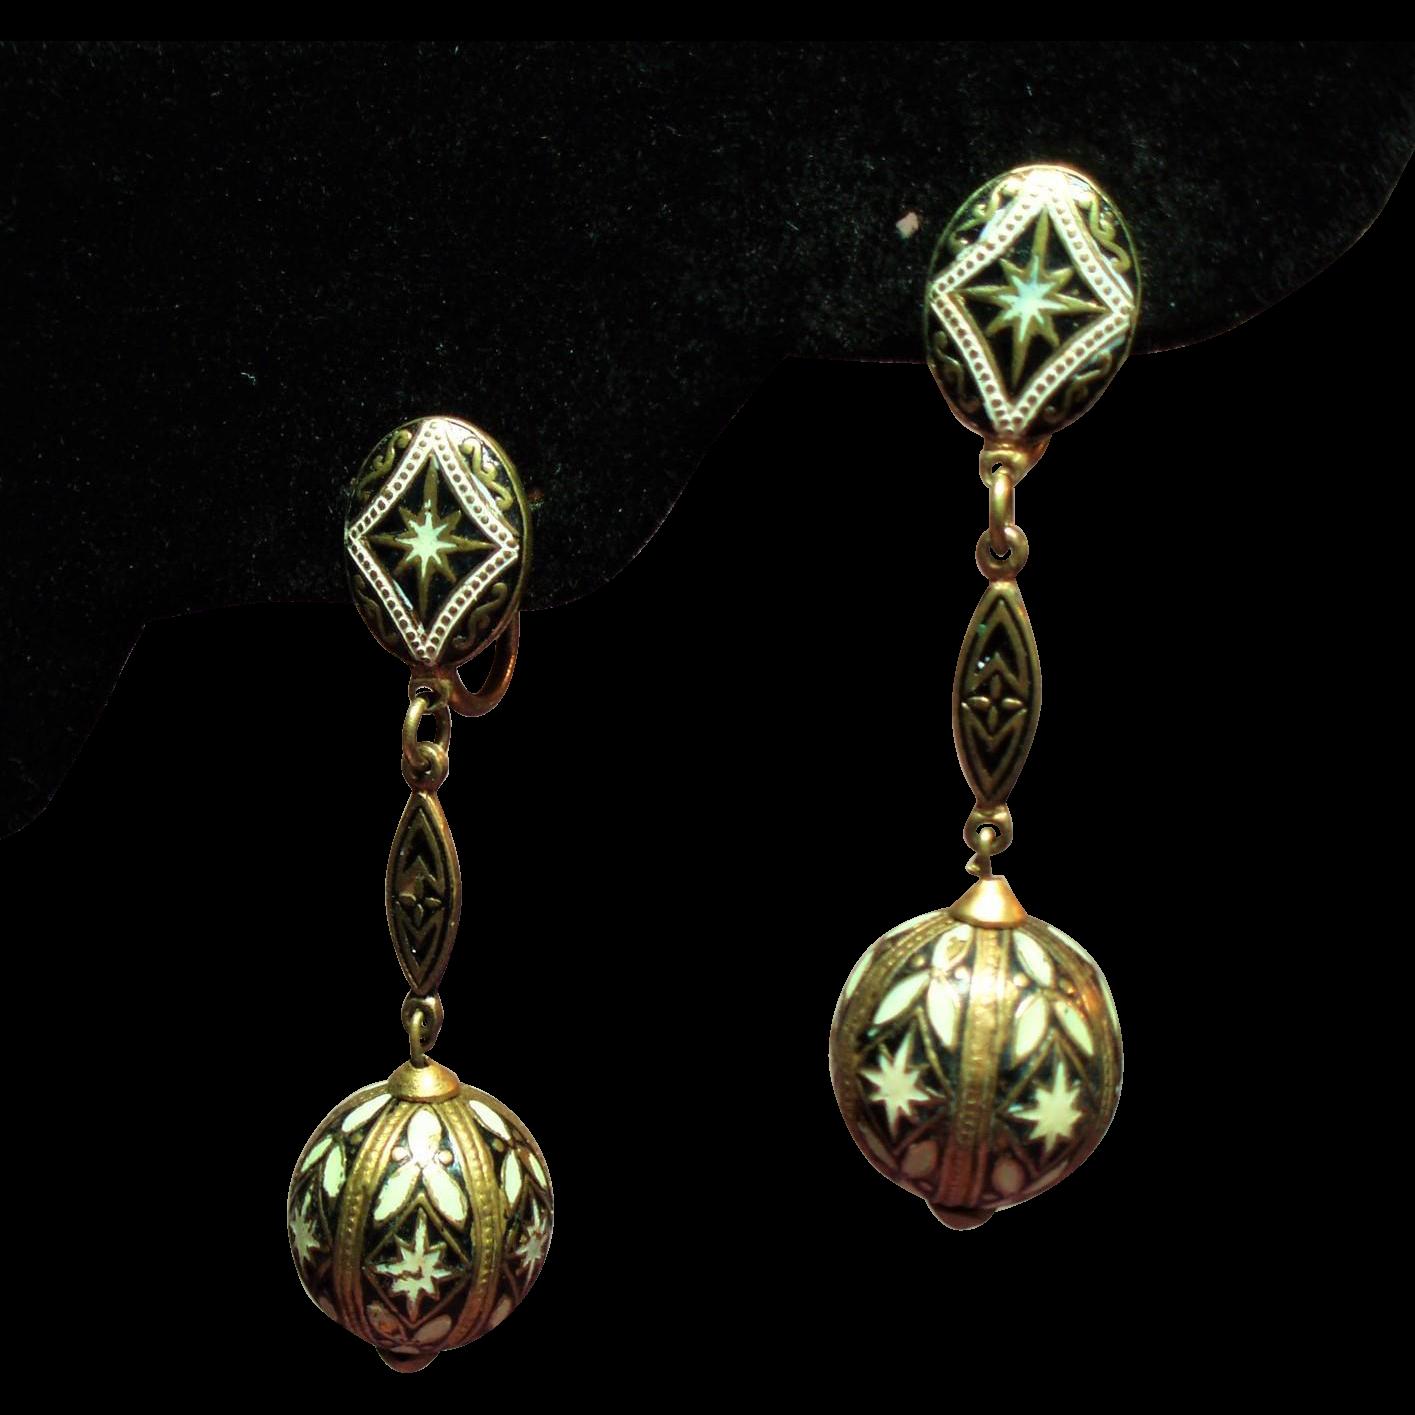 Vintage Damascene Spain Long Drop Pendant Earrings